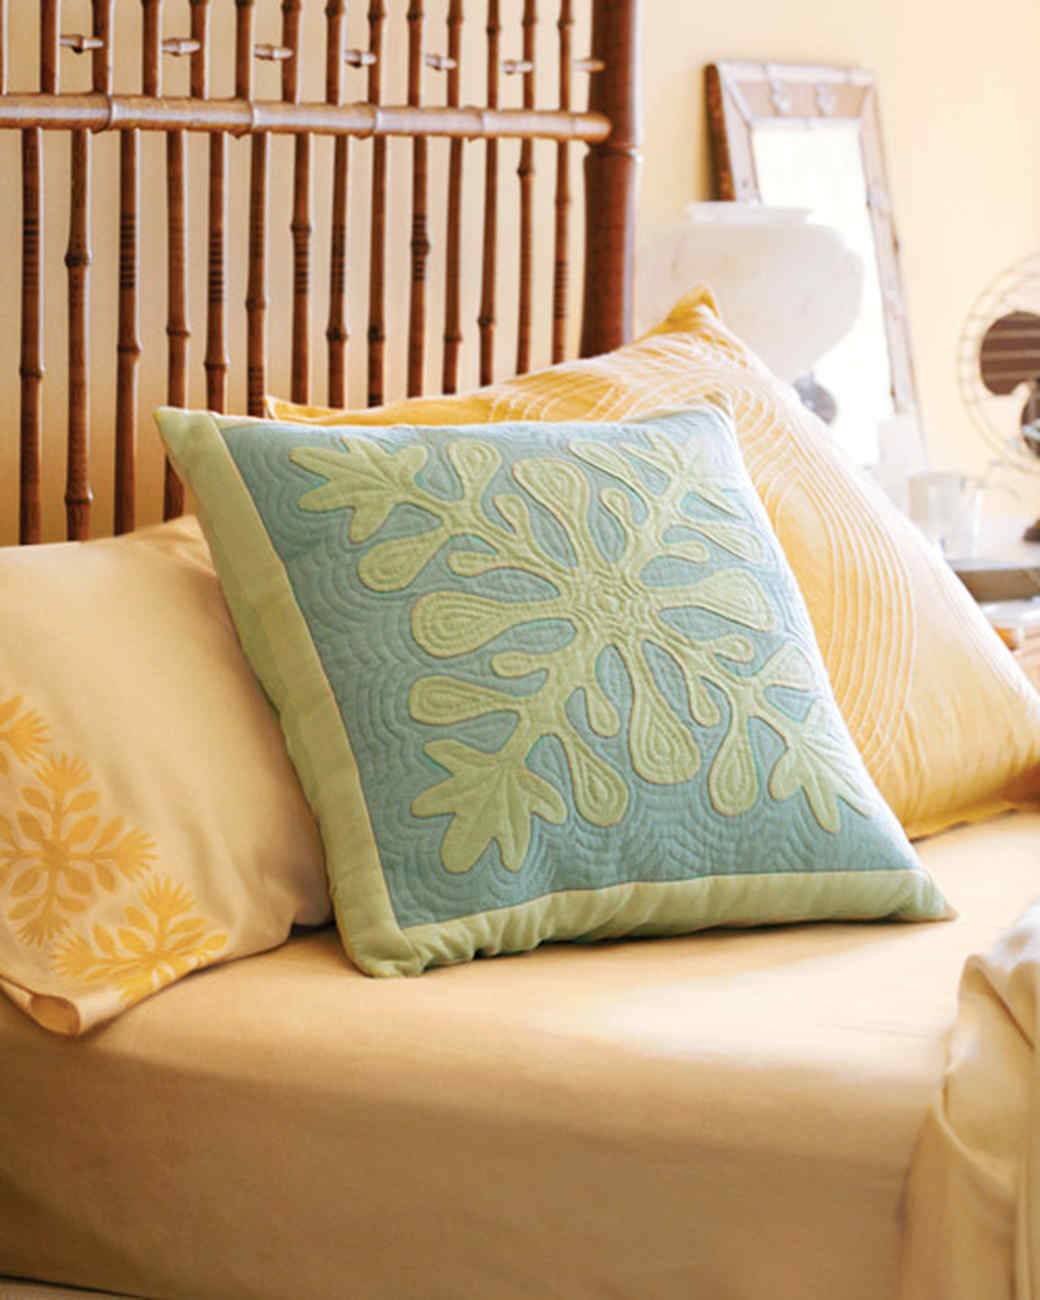 & How to Make a Hawaiian Quilted Pillow Cover | Martha Stewart pillowsntoast.com